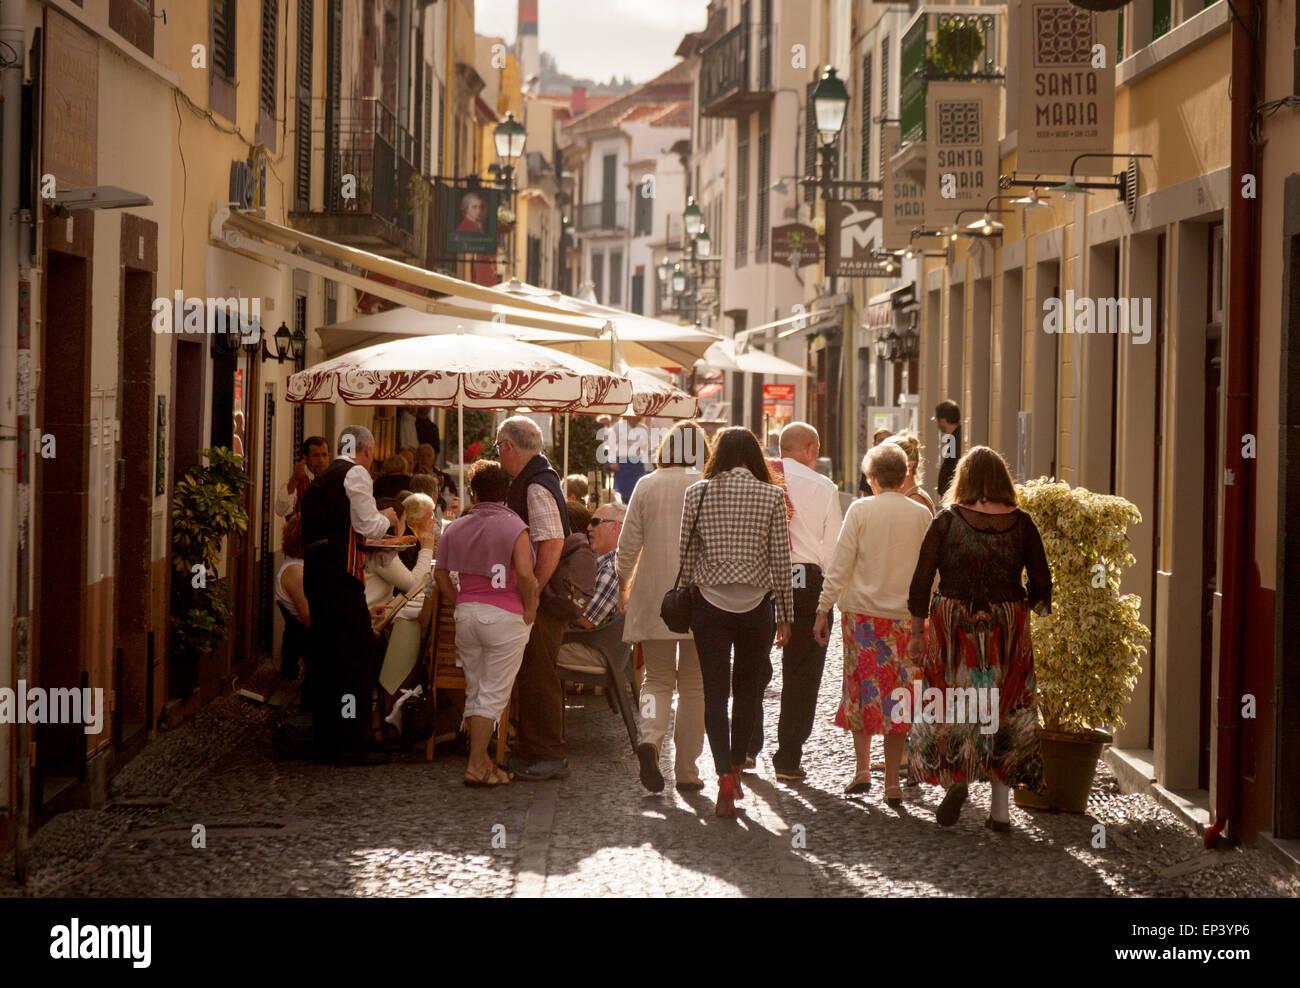 Tourists walking in Rua Santa Maria, the Old Town ( Zona Velha ), Funchal, Madeira, Europe Stock Photo